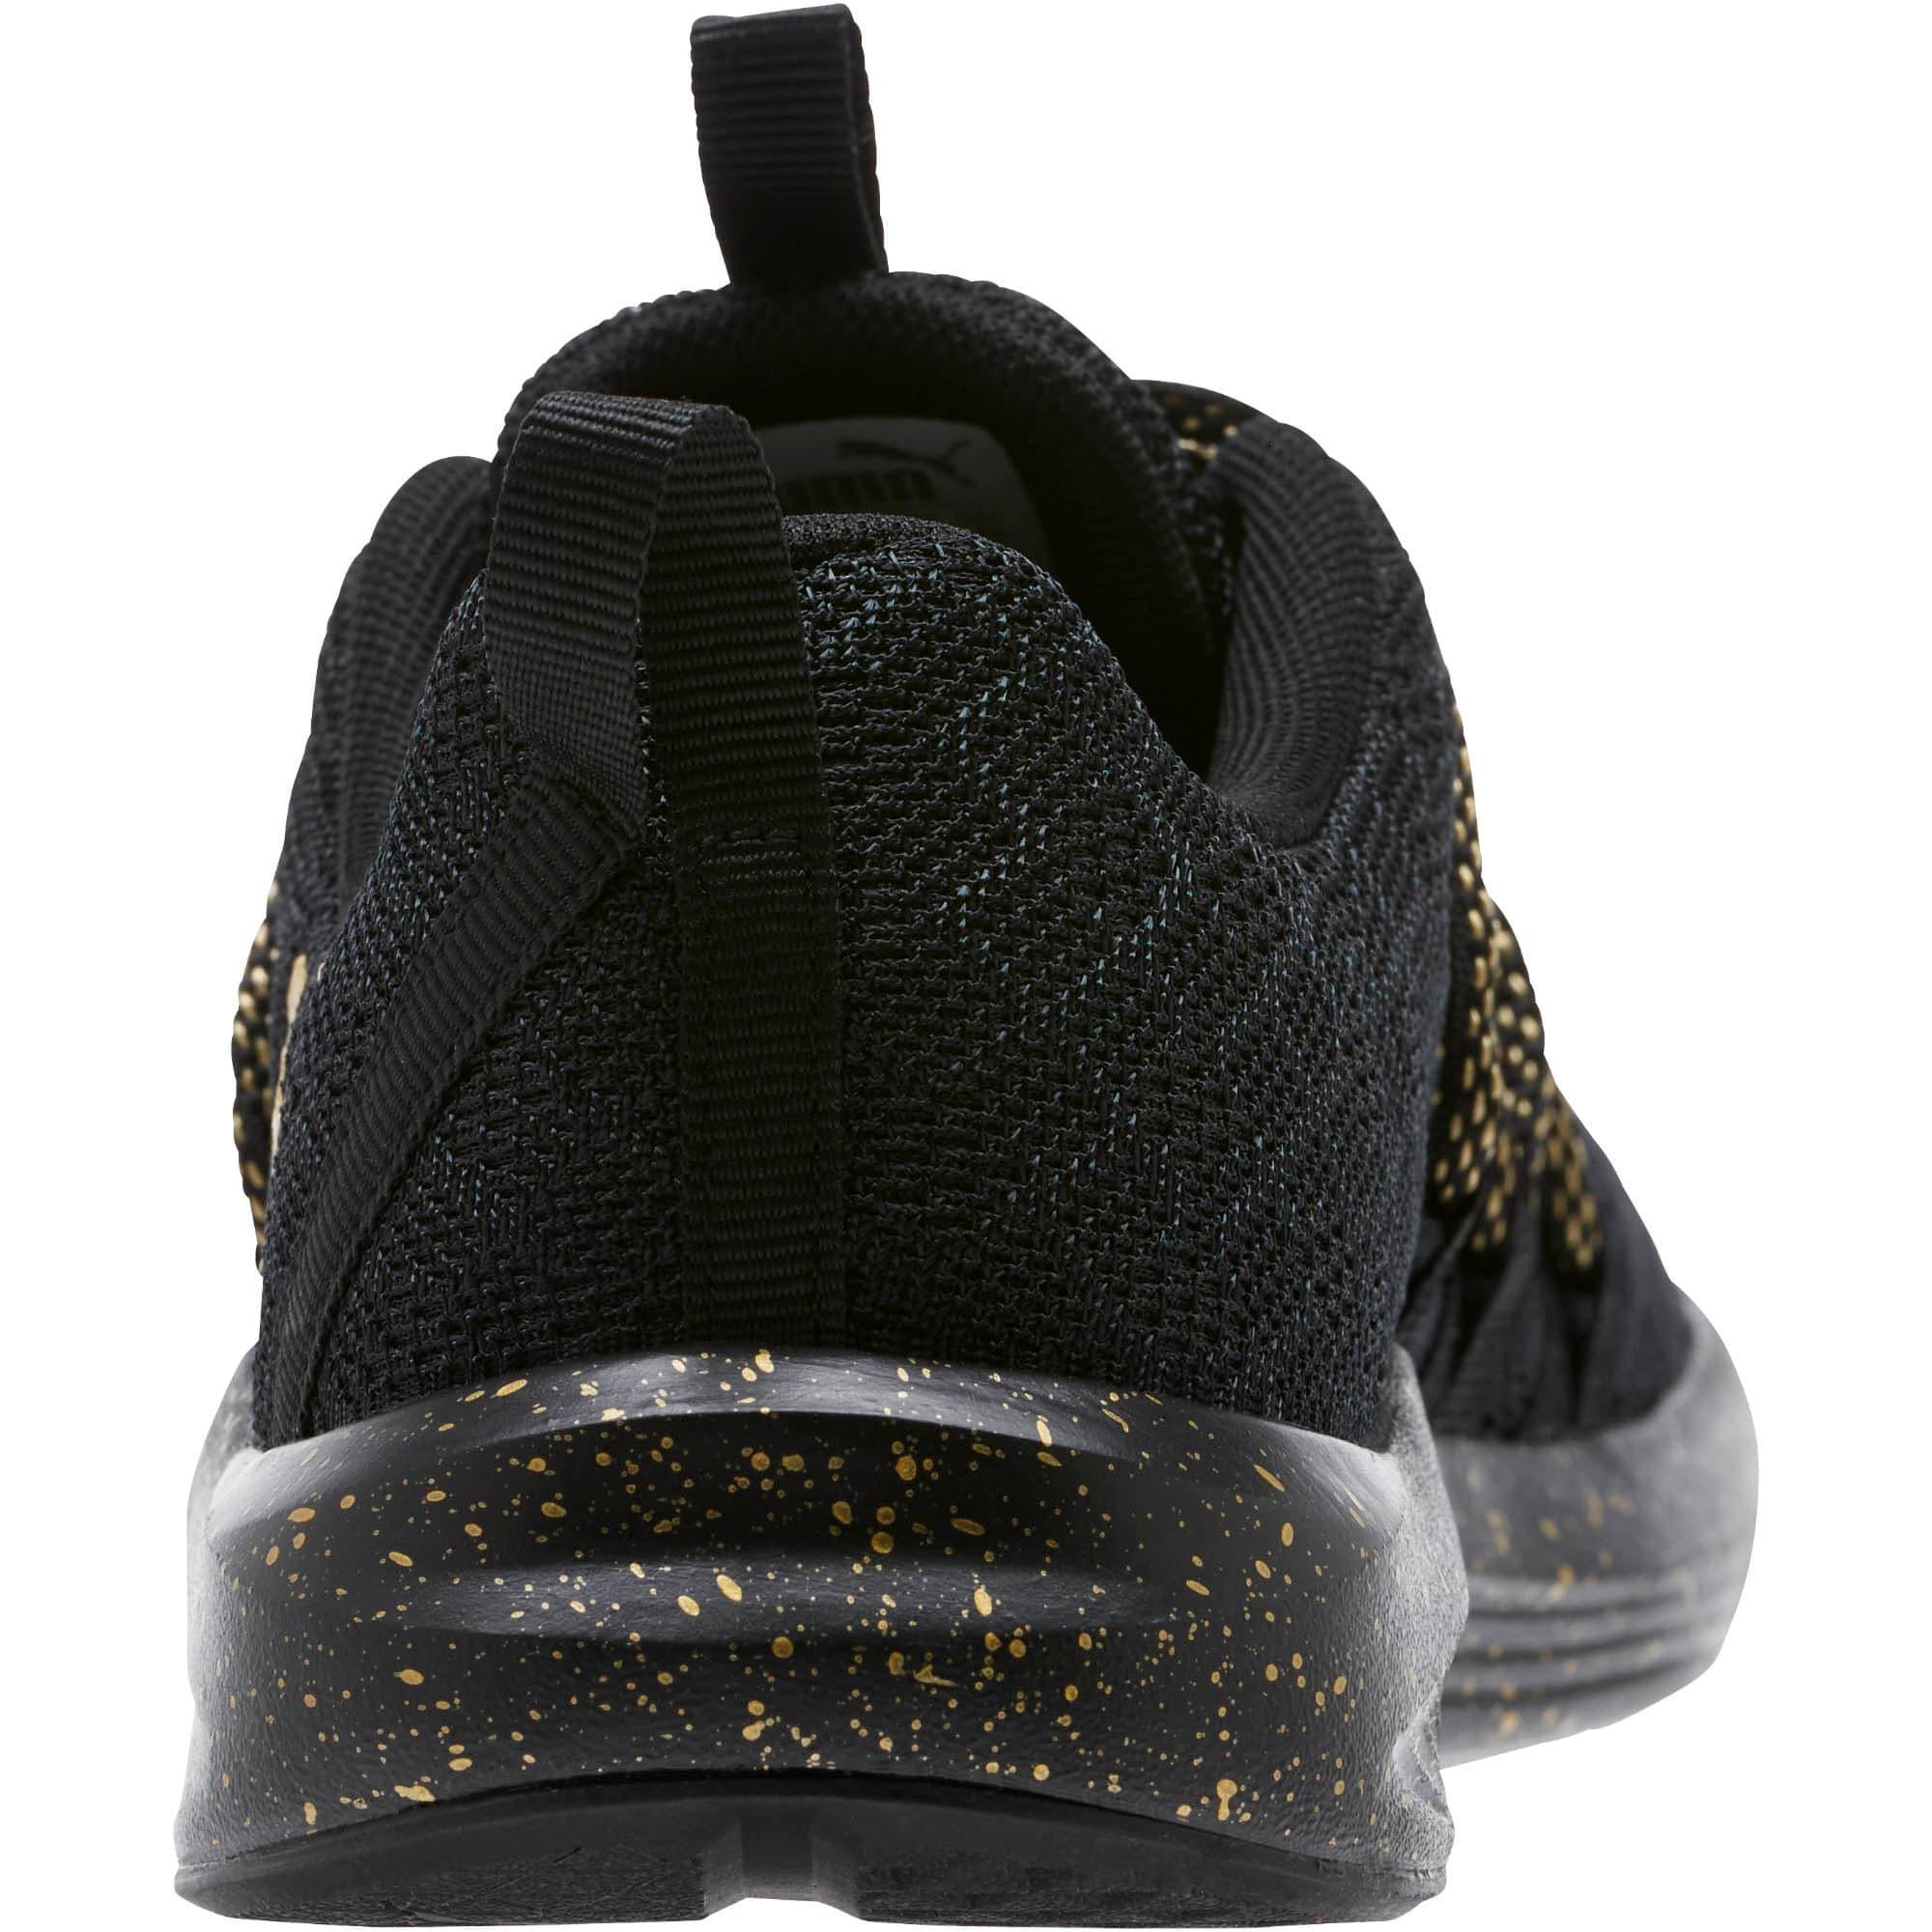 Thumbnail 4 of Prowl Alt Mesh Speckle Women's Training Shoes, Puma Black-Puma Team Gold, medium